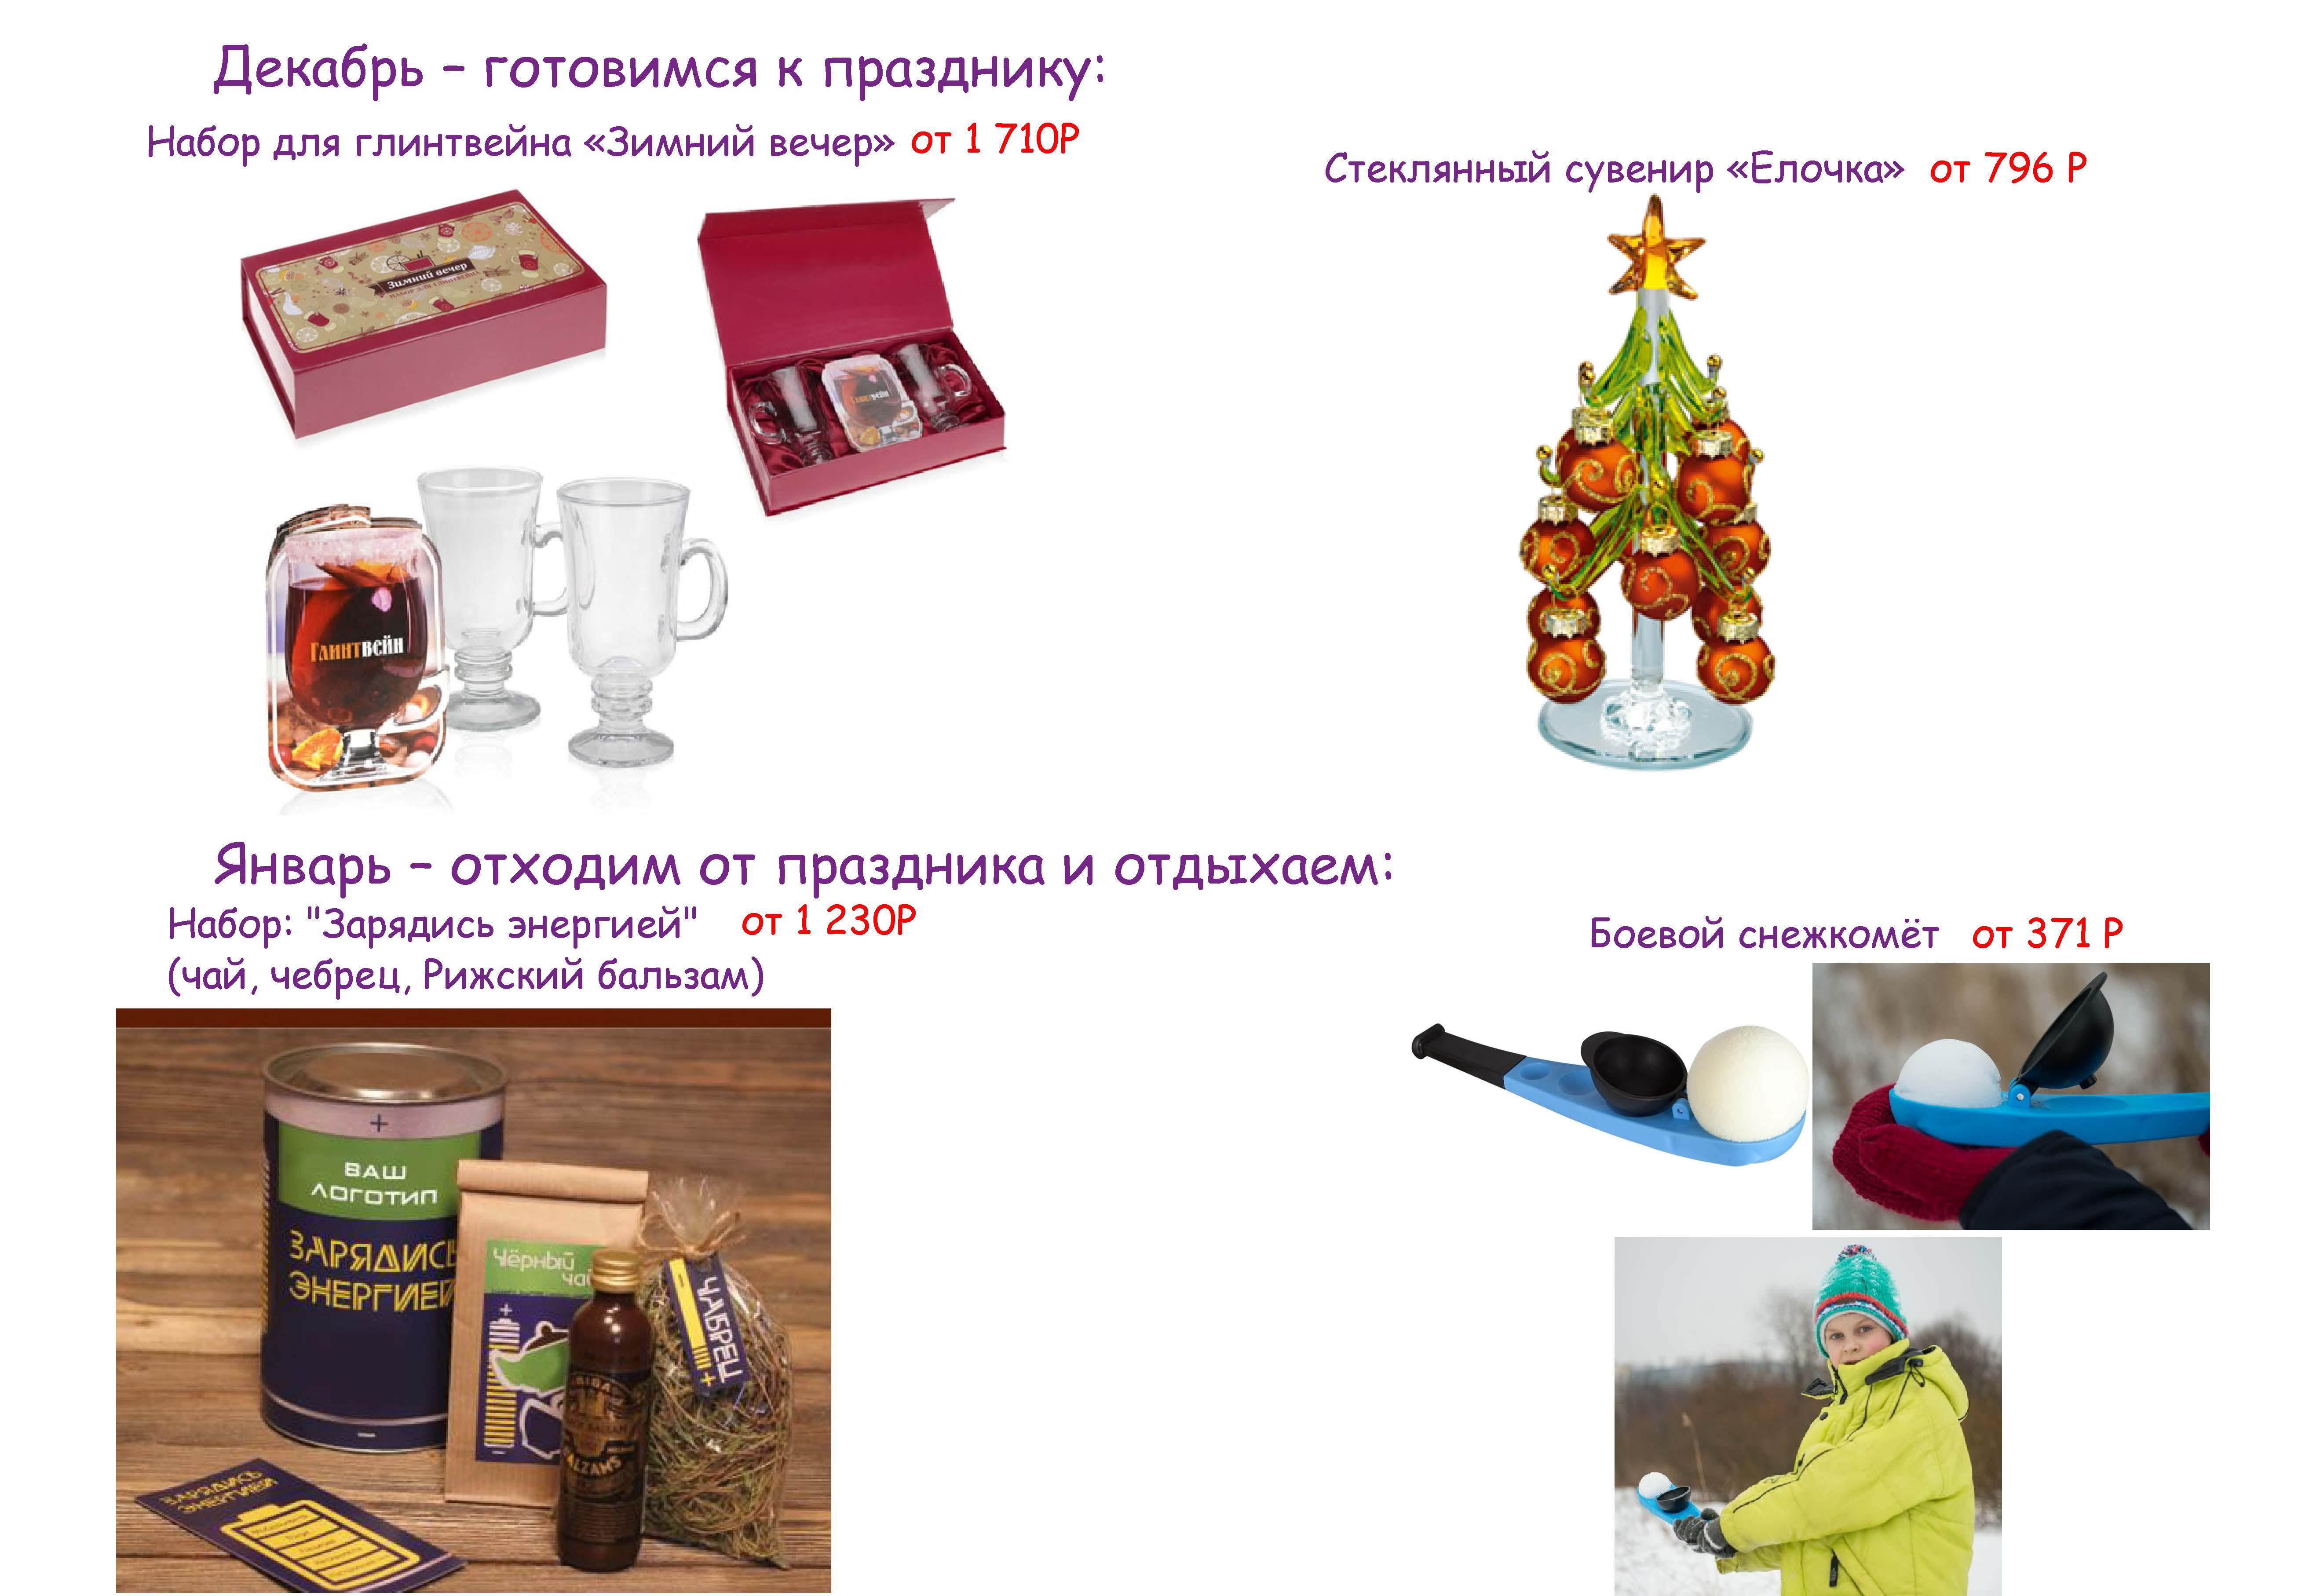 prezentation_ng_2017_stranitsa_06